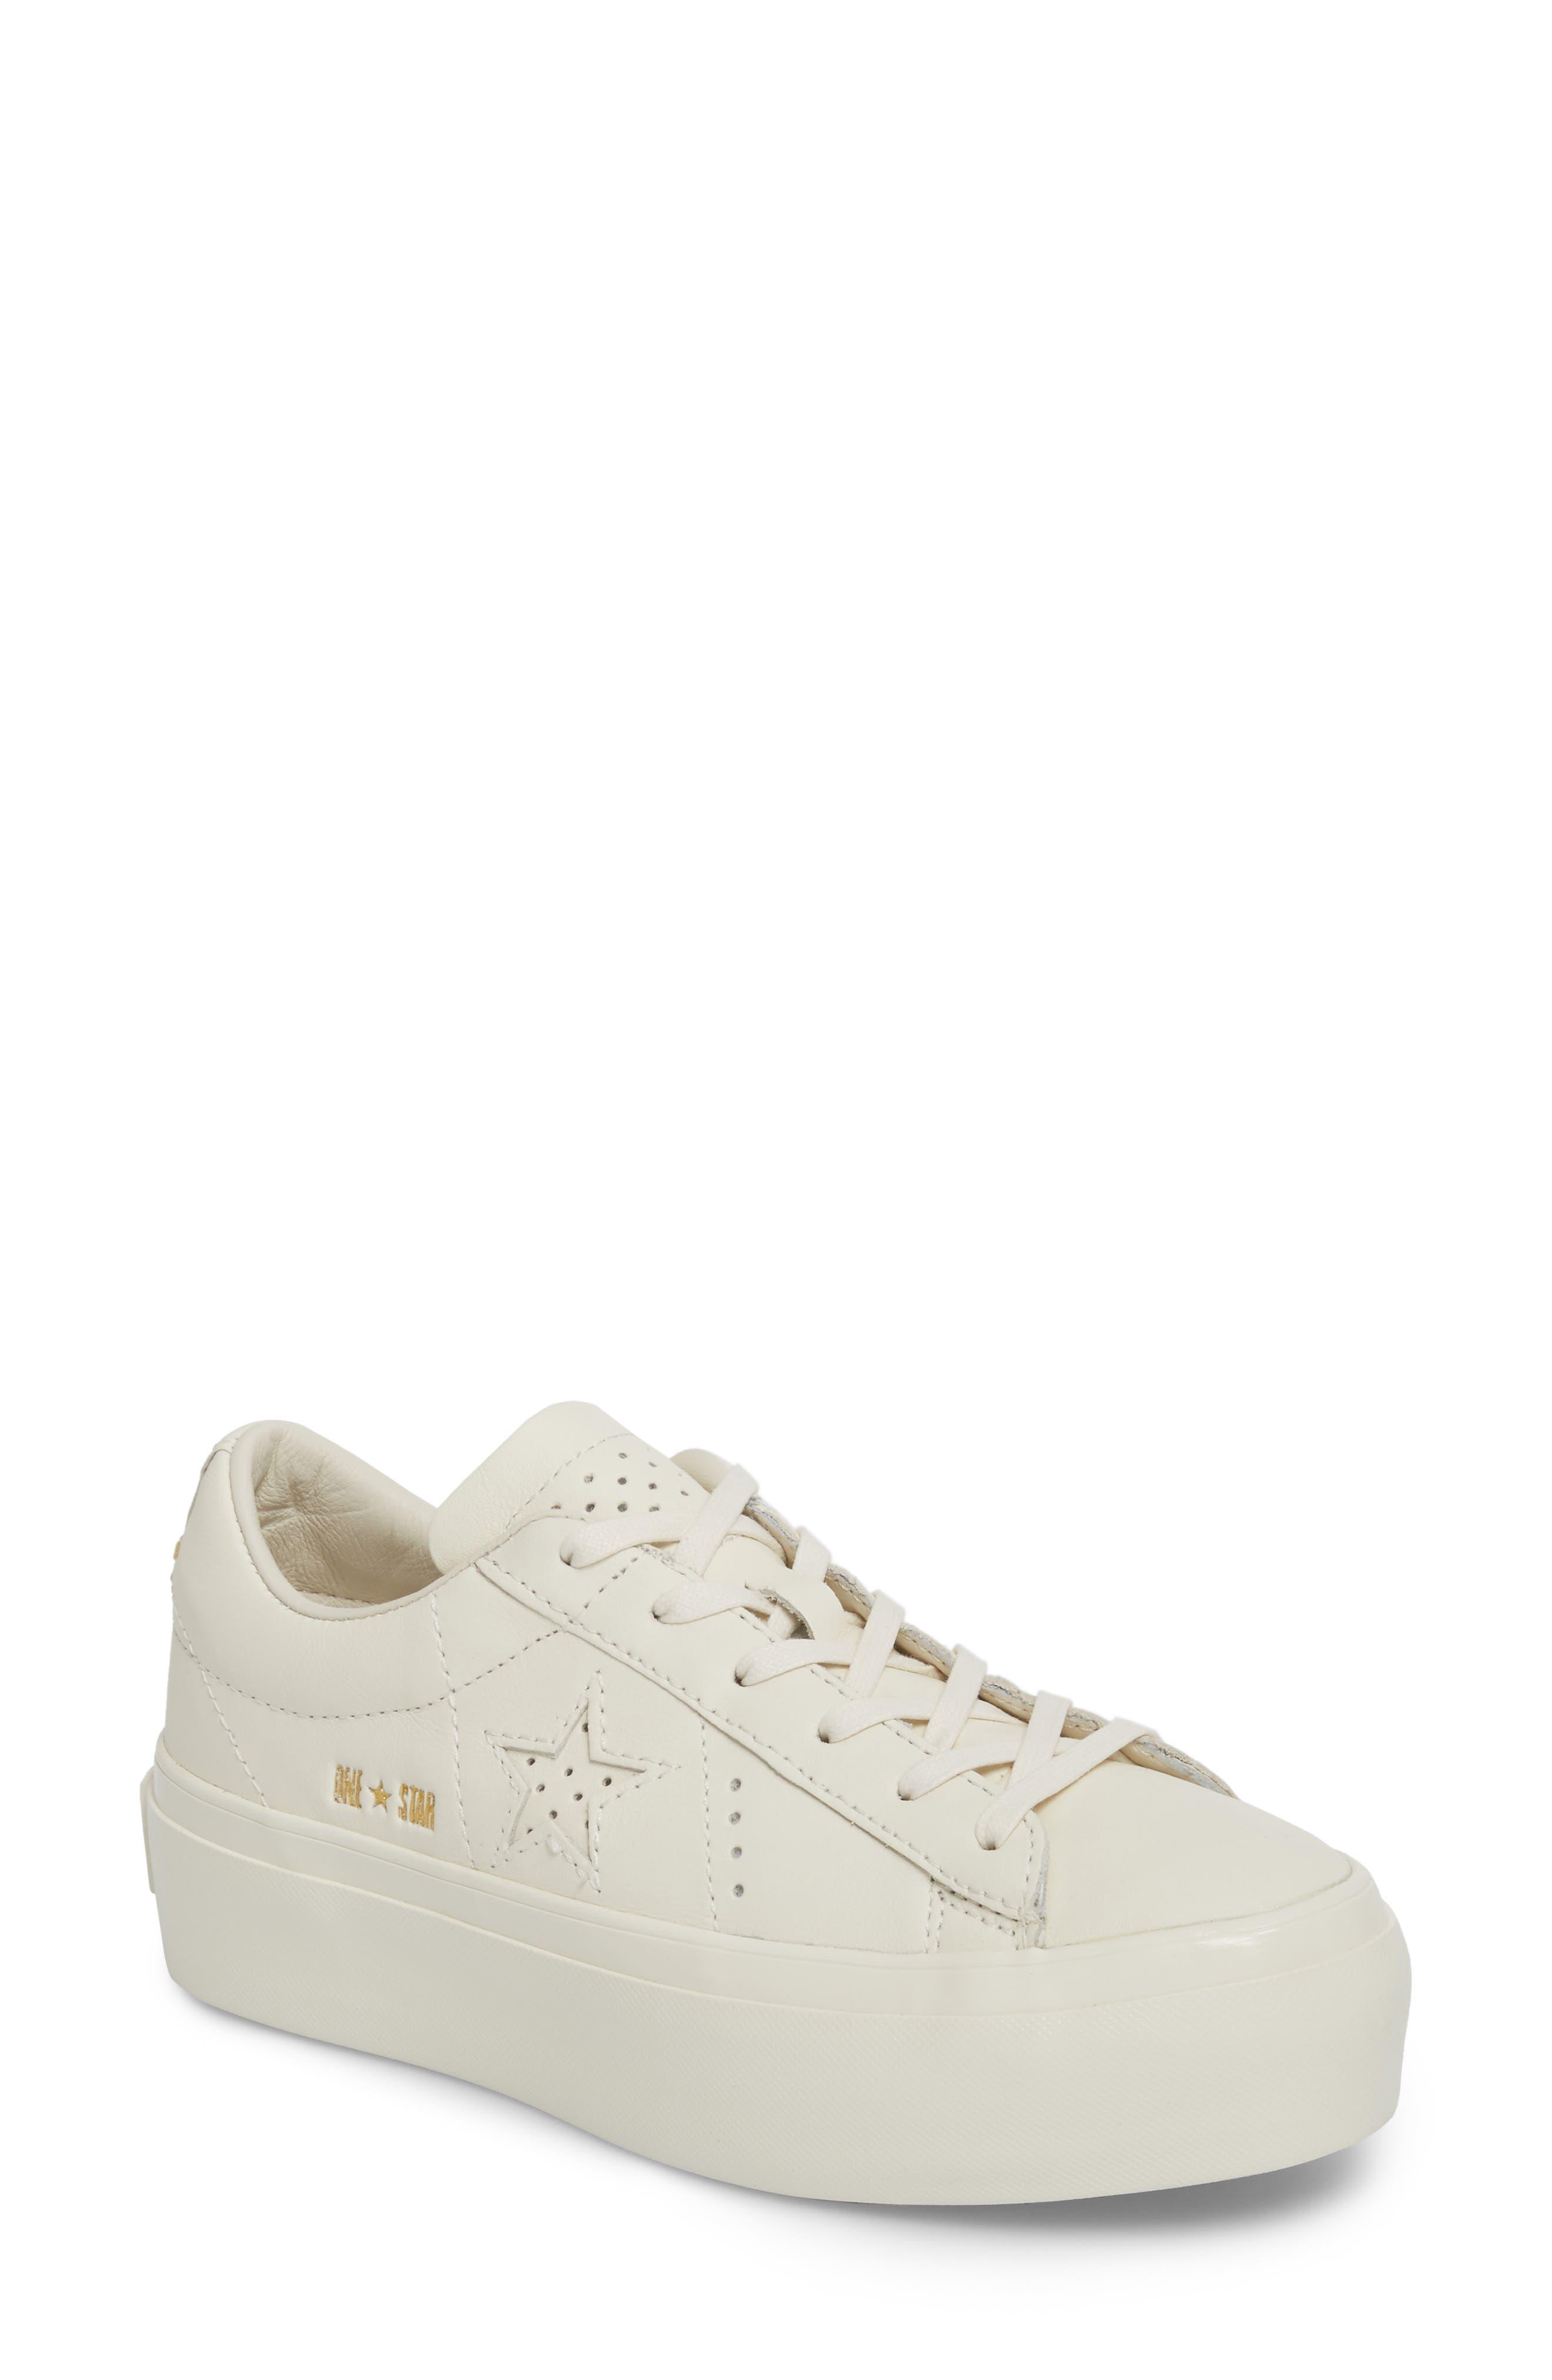 Chuck Taylor<sup>®</sup> All Star<sup>®</sup> One Star Platform Sneaker,                             Main thumbnail 1, color,                             101